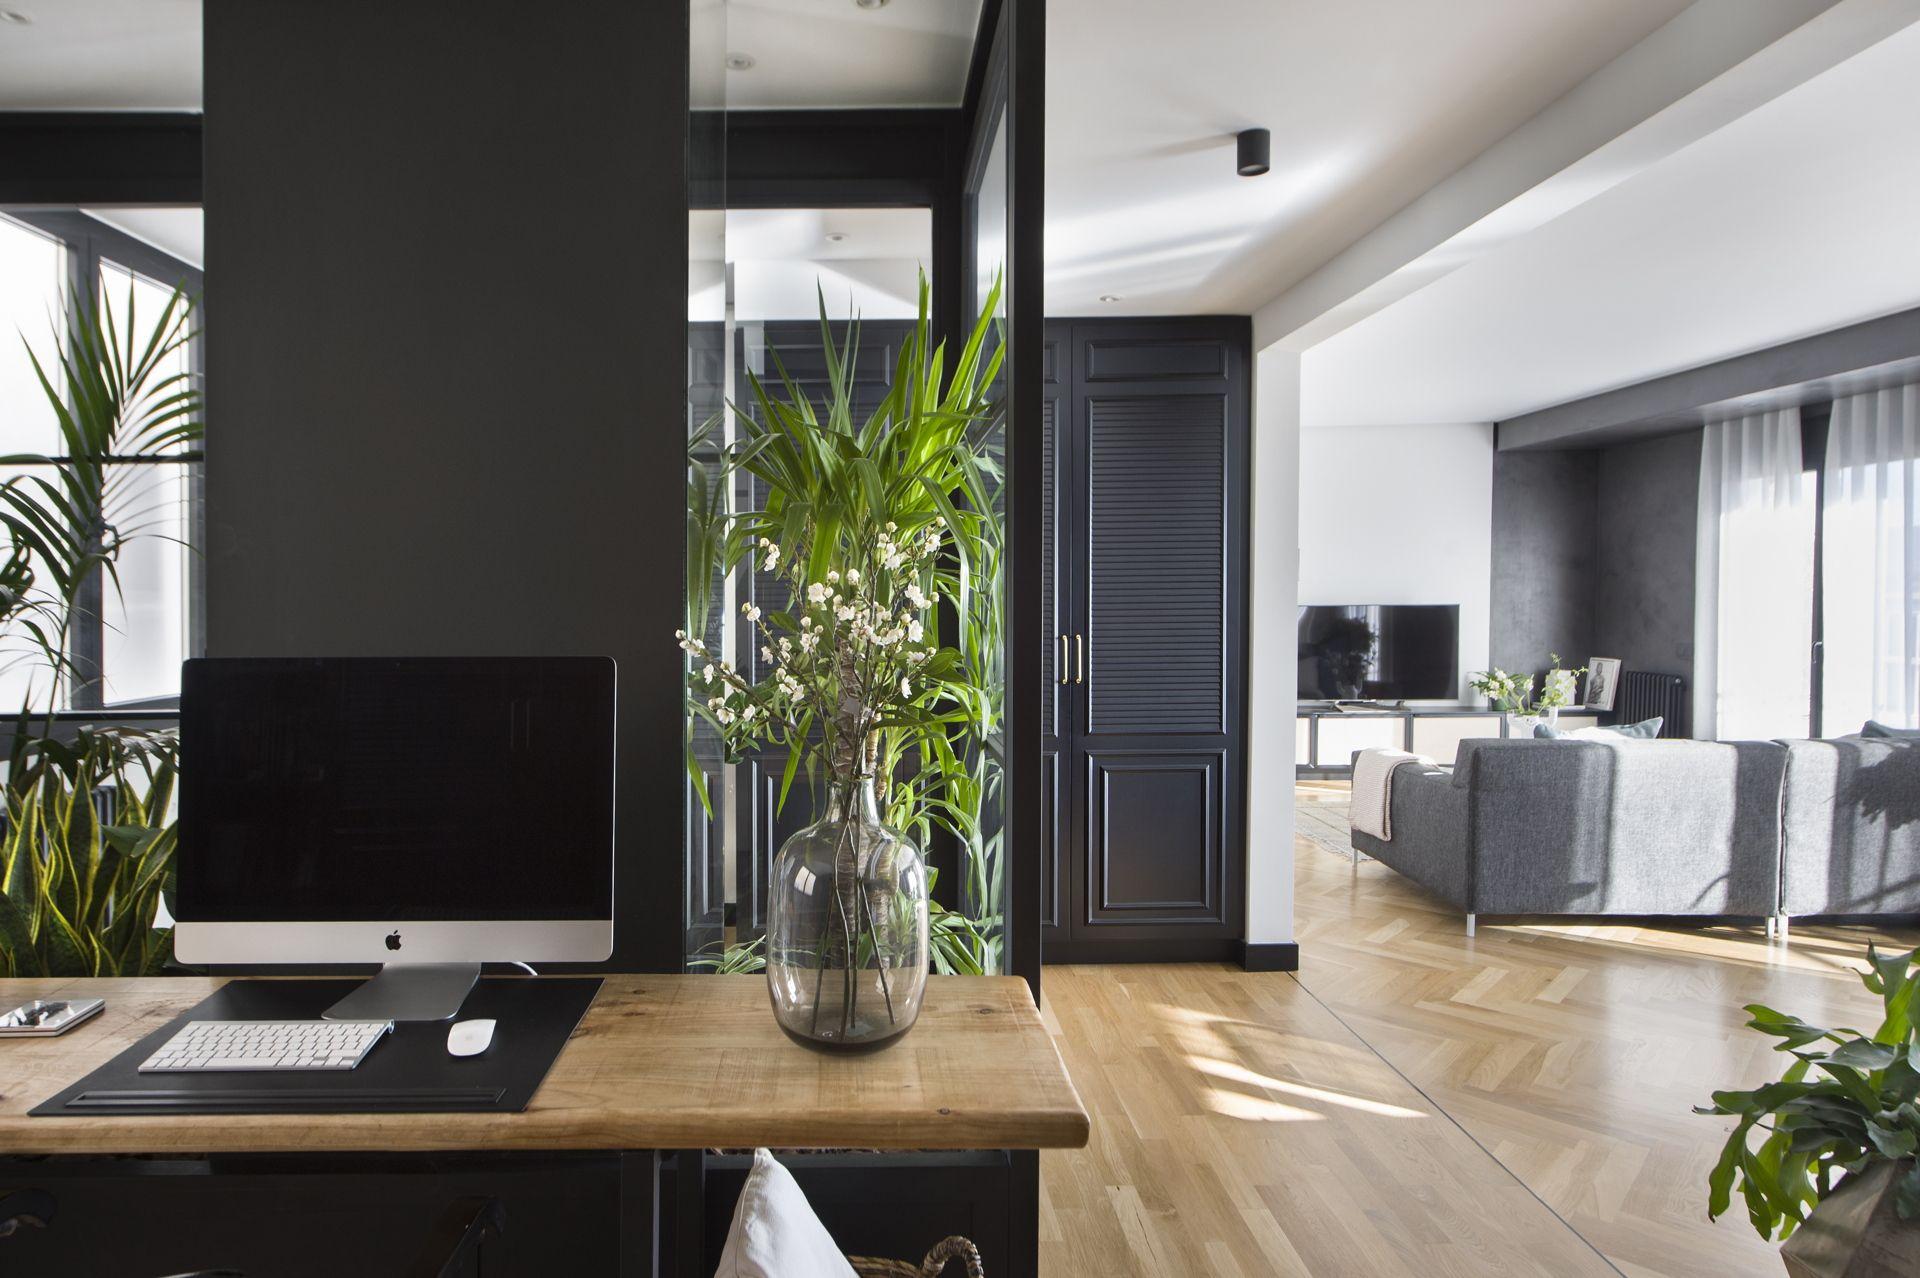 Living Hub By Egue Y Seta Livegreenblog In 2020 Living Room Trends Farm House Living Room Living Room Dyi